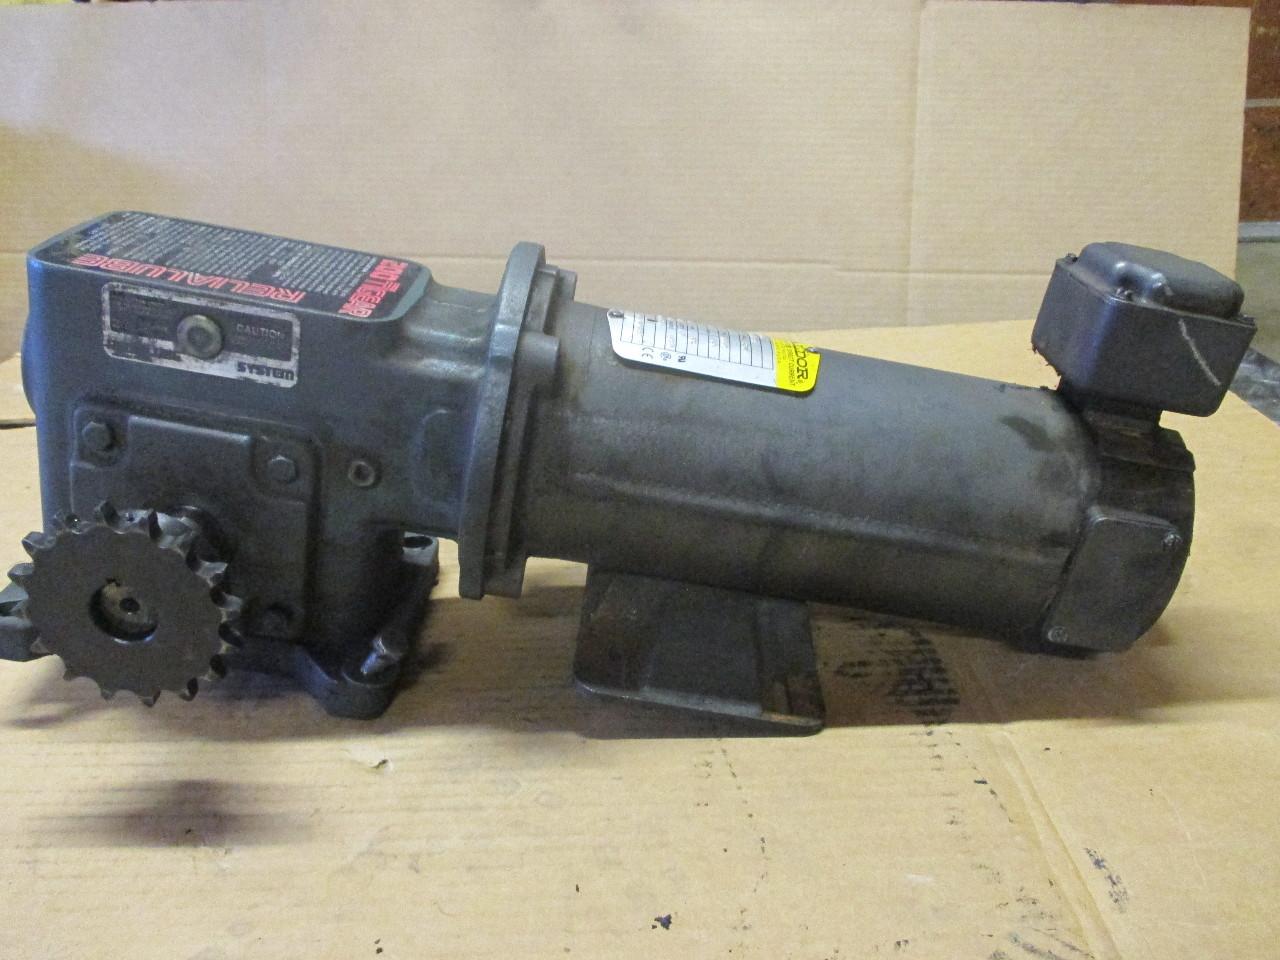 Baldor - CDP33DC Brushed Motor, TENV (Totally Enclosed Non)